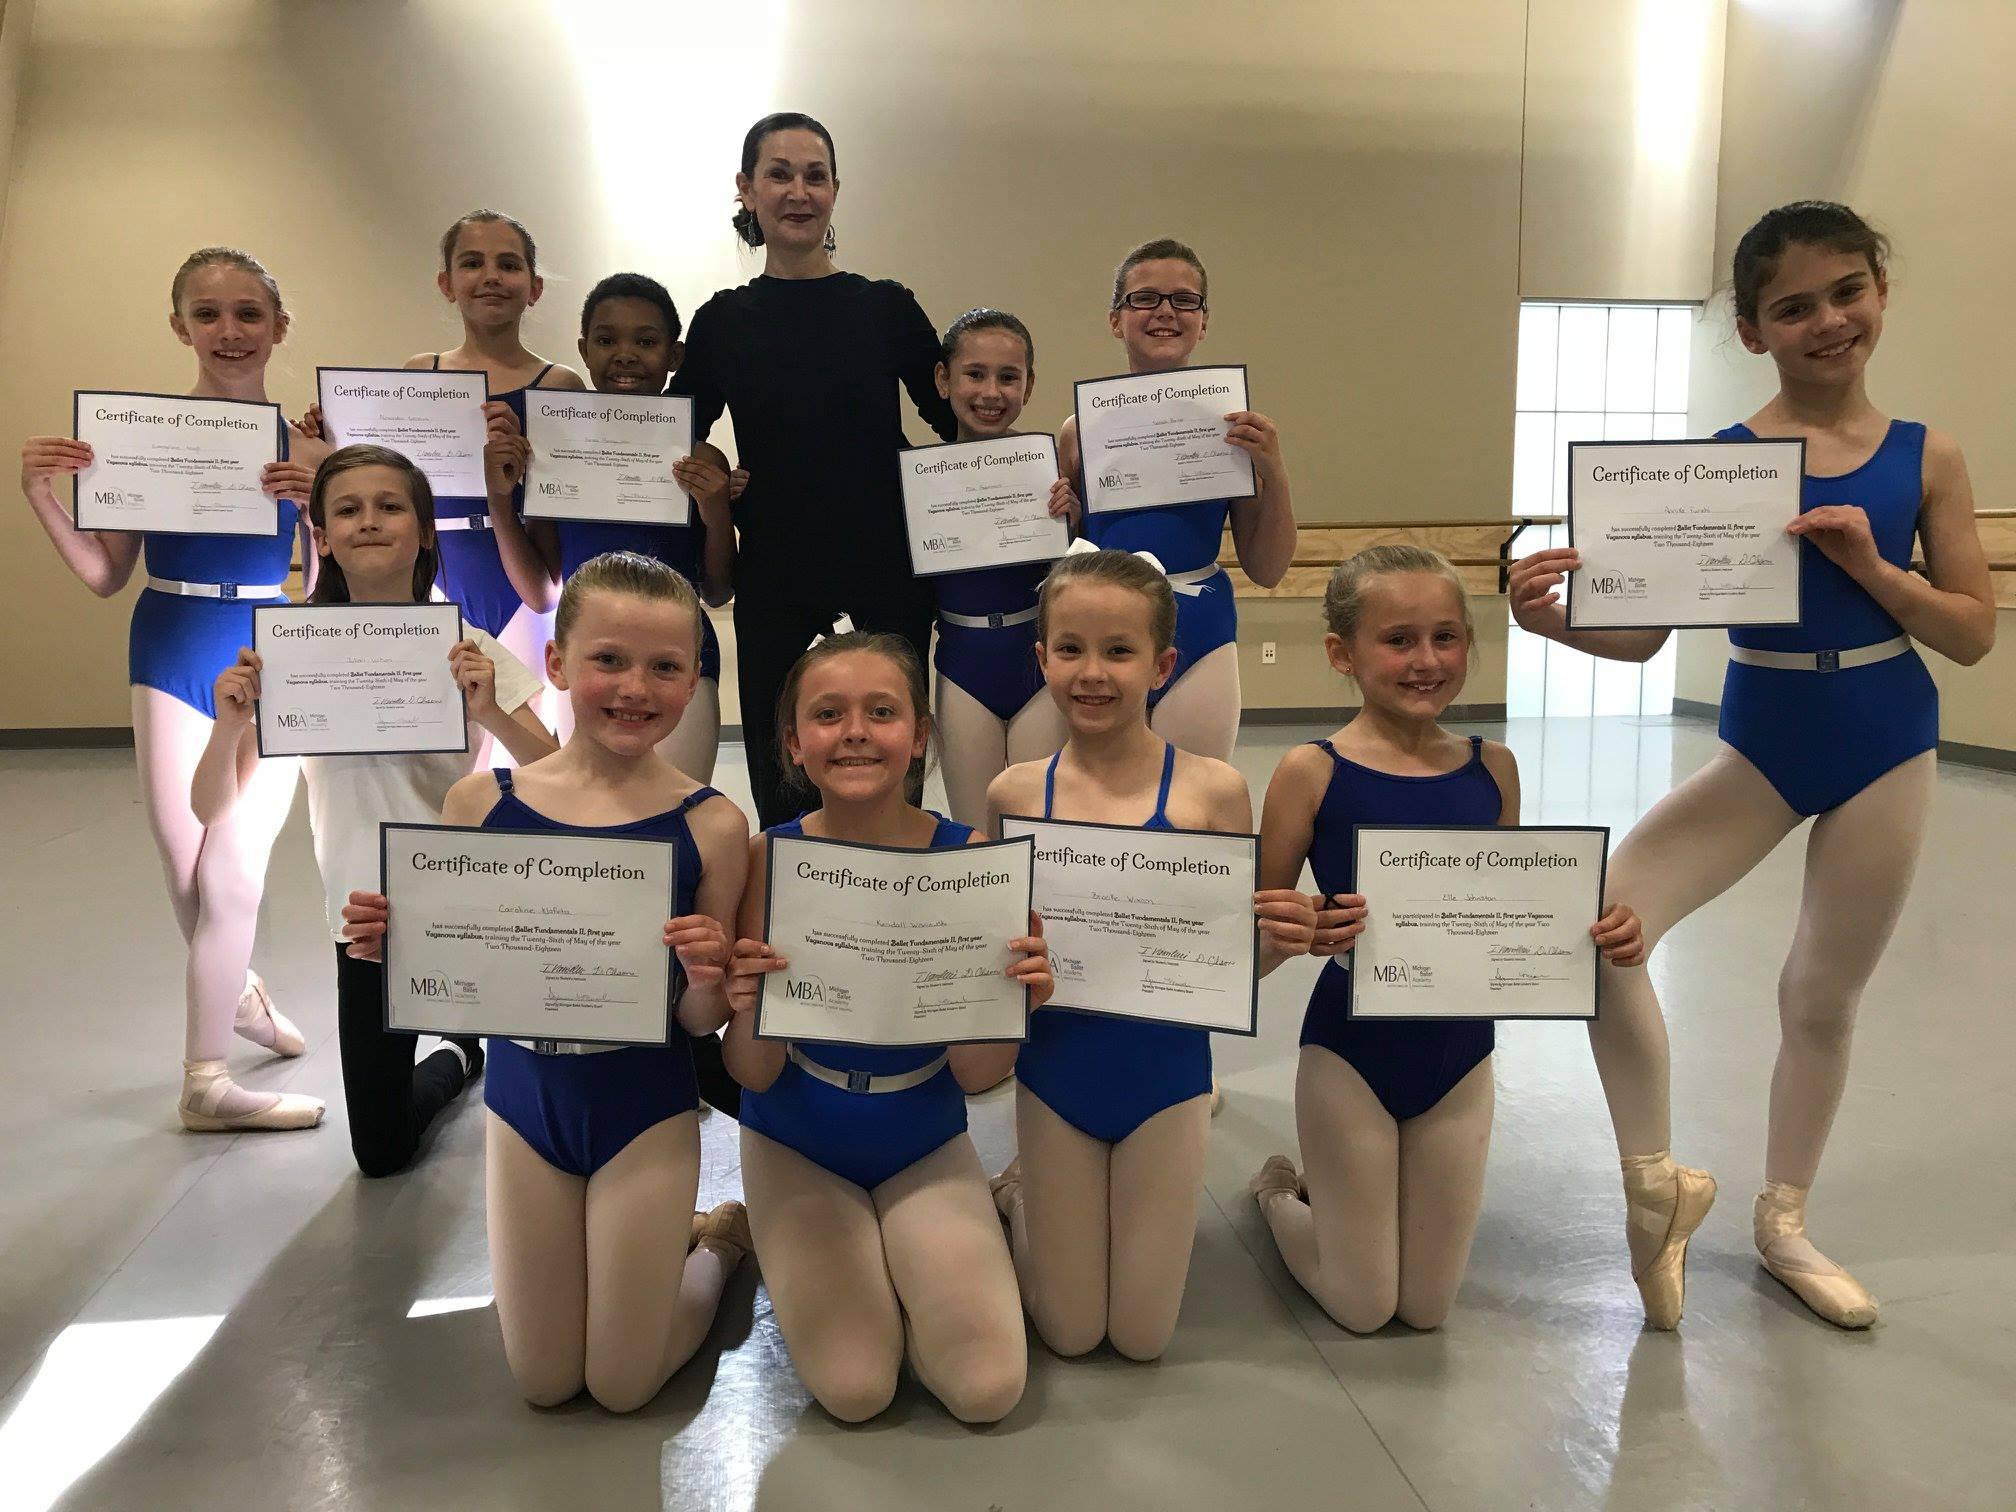 ballet_fun_2_certificates.jpg